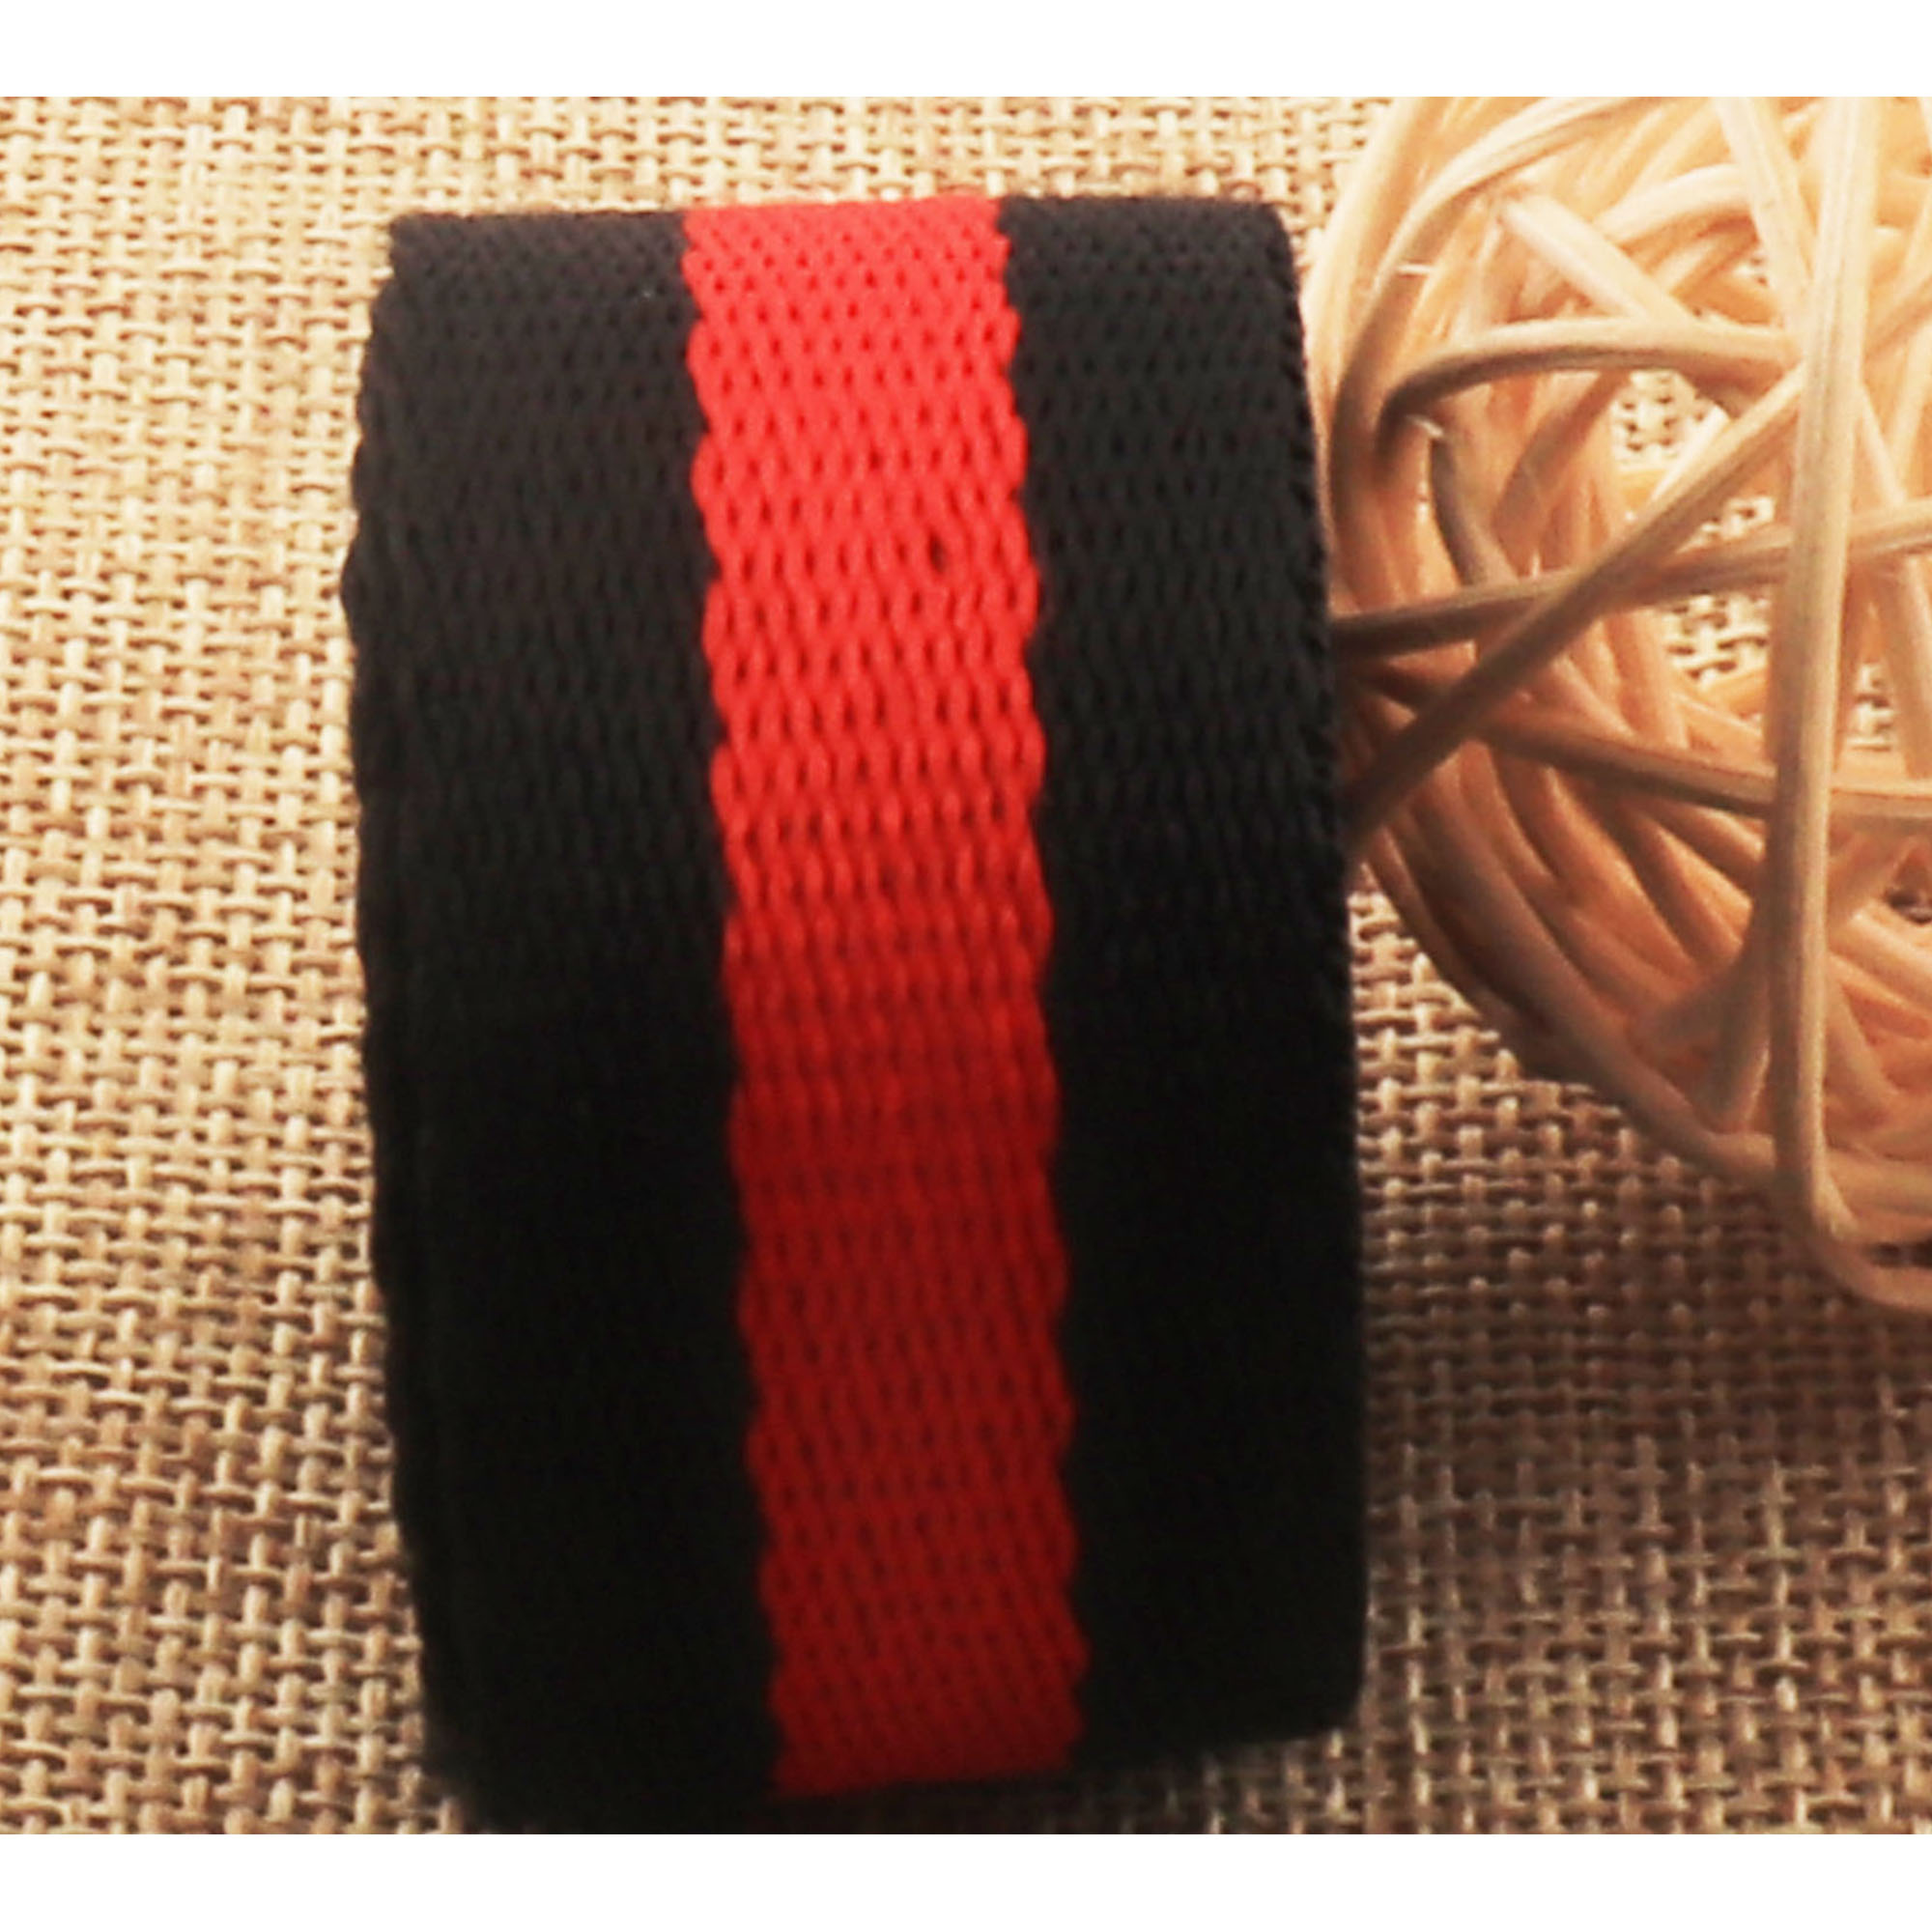 WB535 Natural Soft Cotton Webbing,One Inch Key Fob Webbing leash supplies,bag handle Bag Purse Webbing By The Yard